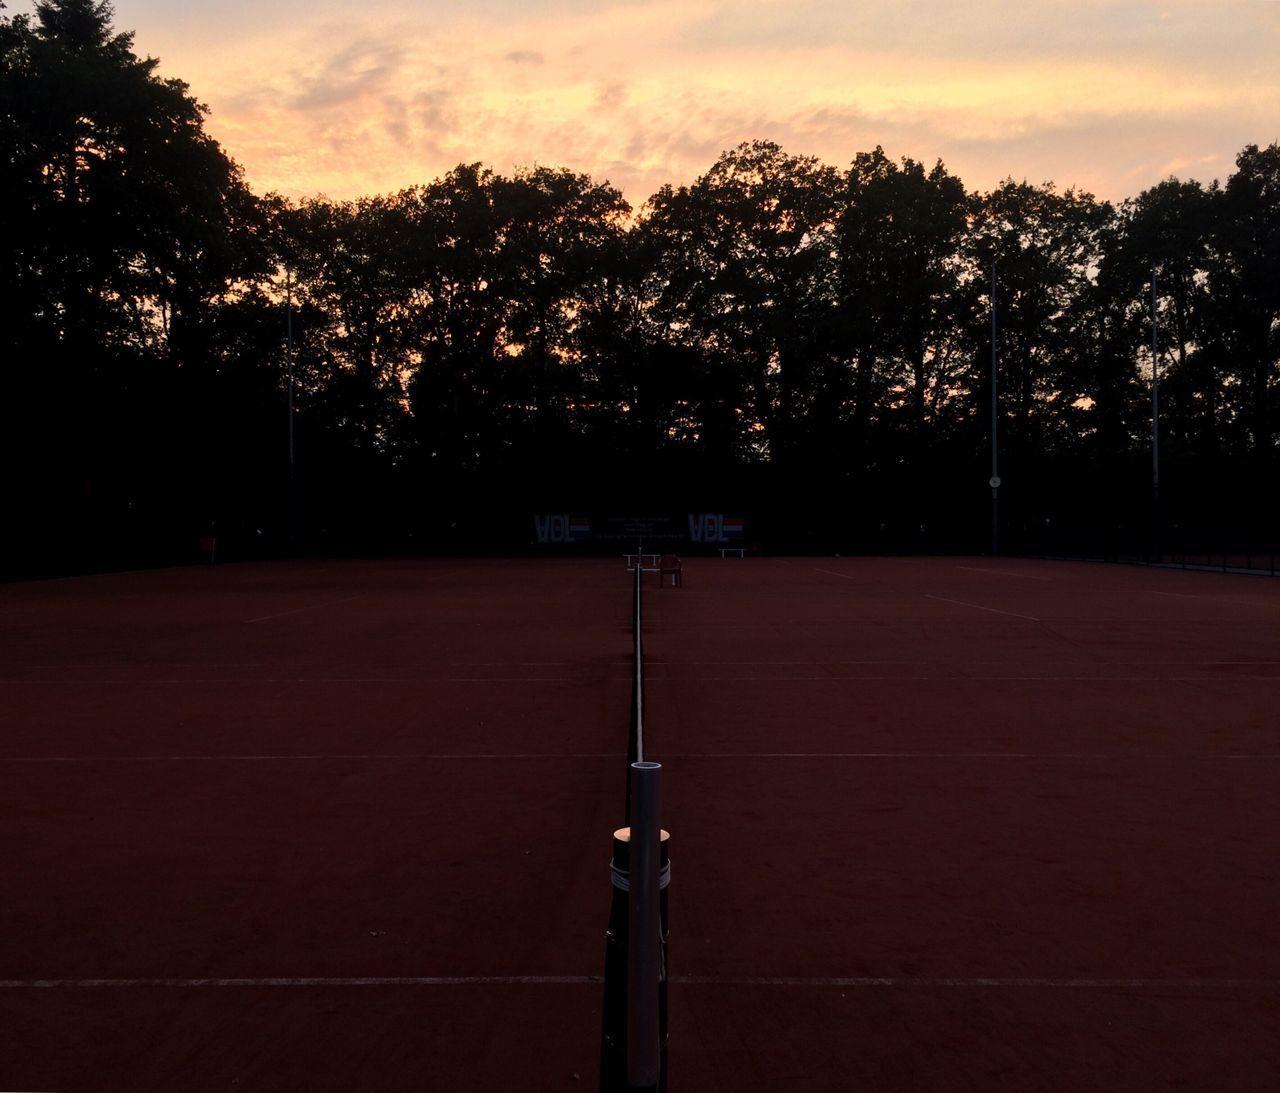 Playing tennis at university... 🎾☀️👌🏻 sSunsettsSilhouettesSkyoOrange ColoroOutdoorstTranquility cCloud - SkysScenicstTenniscourttTennis 🎾University Campus Sport Netherlands Campus Campus Life